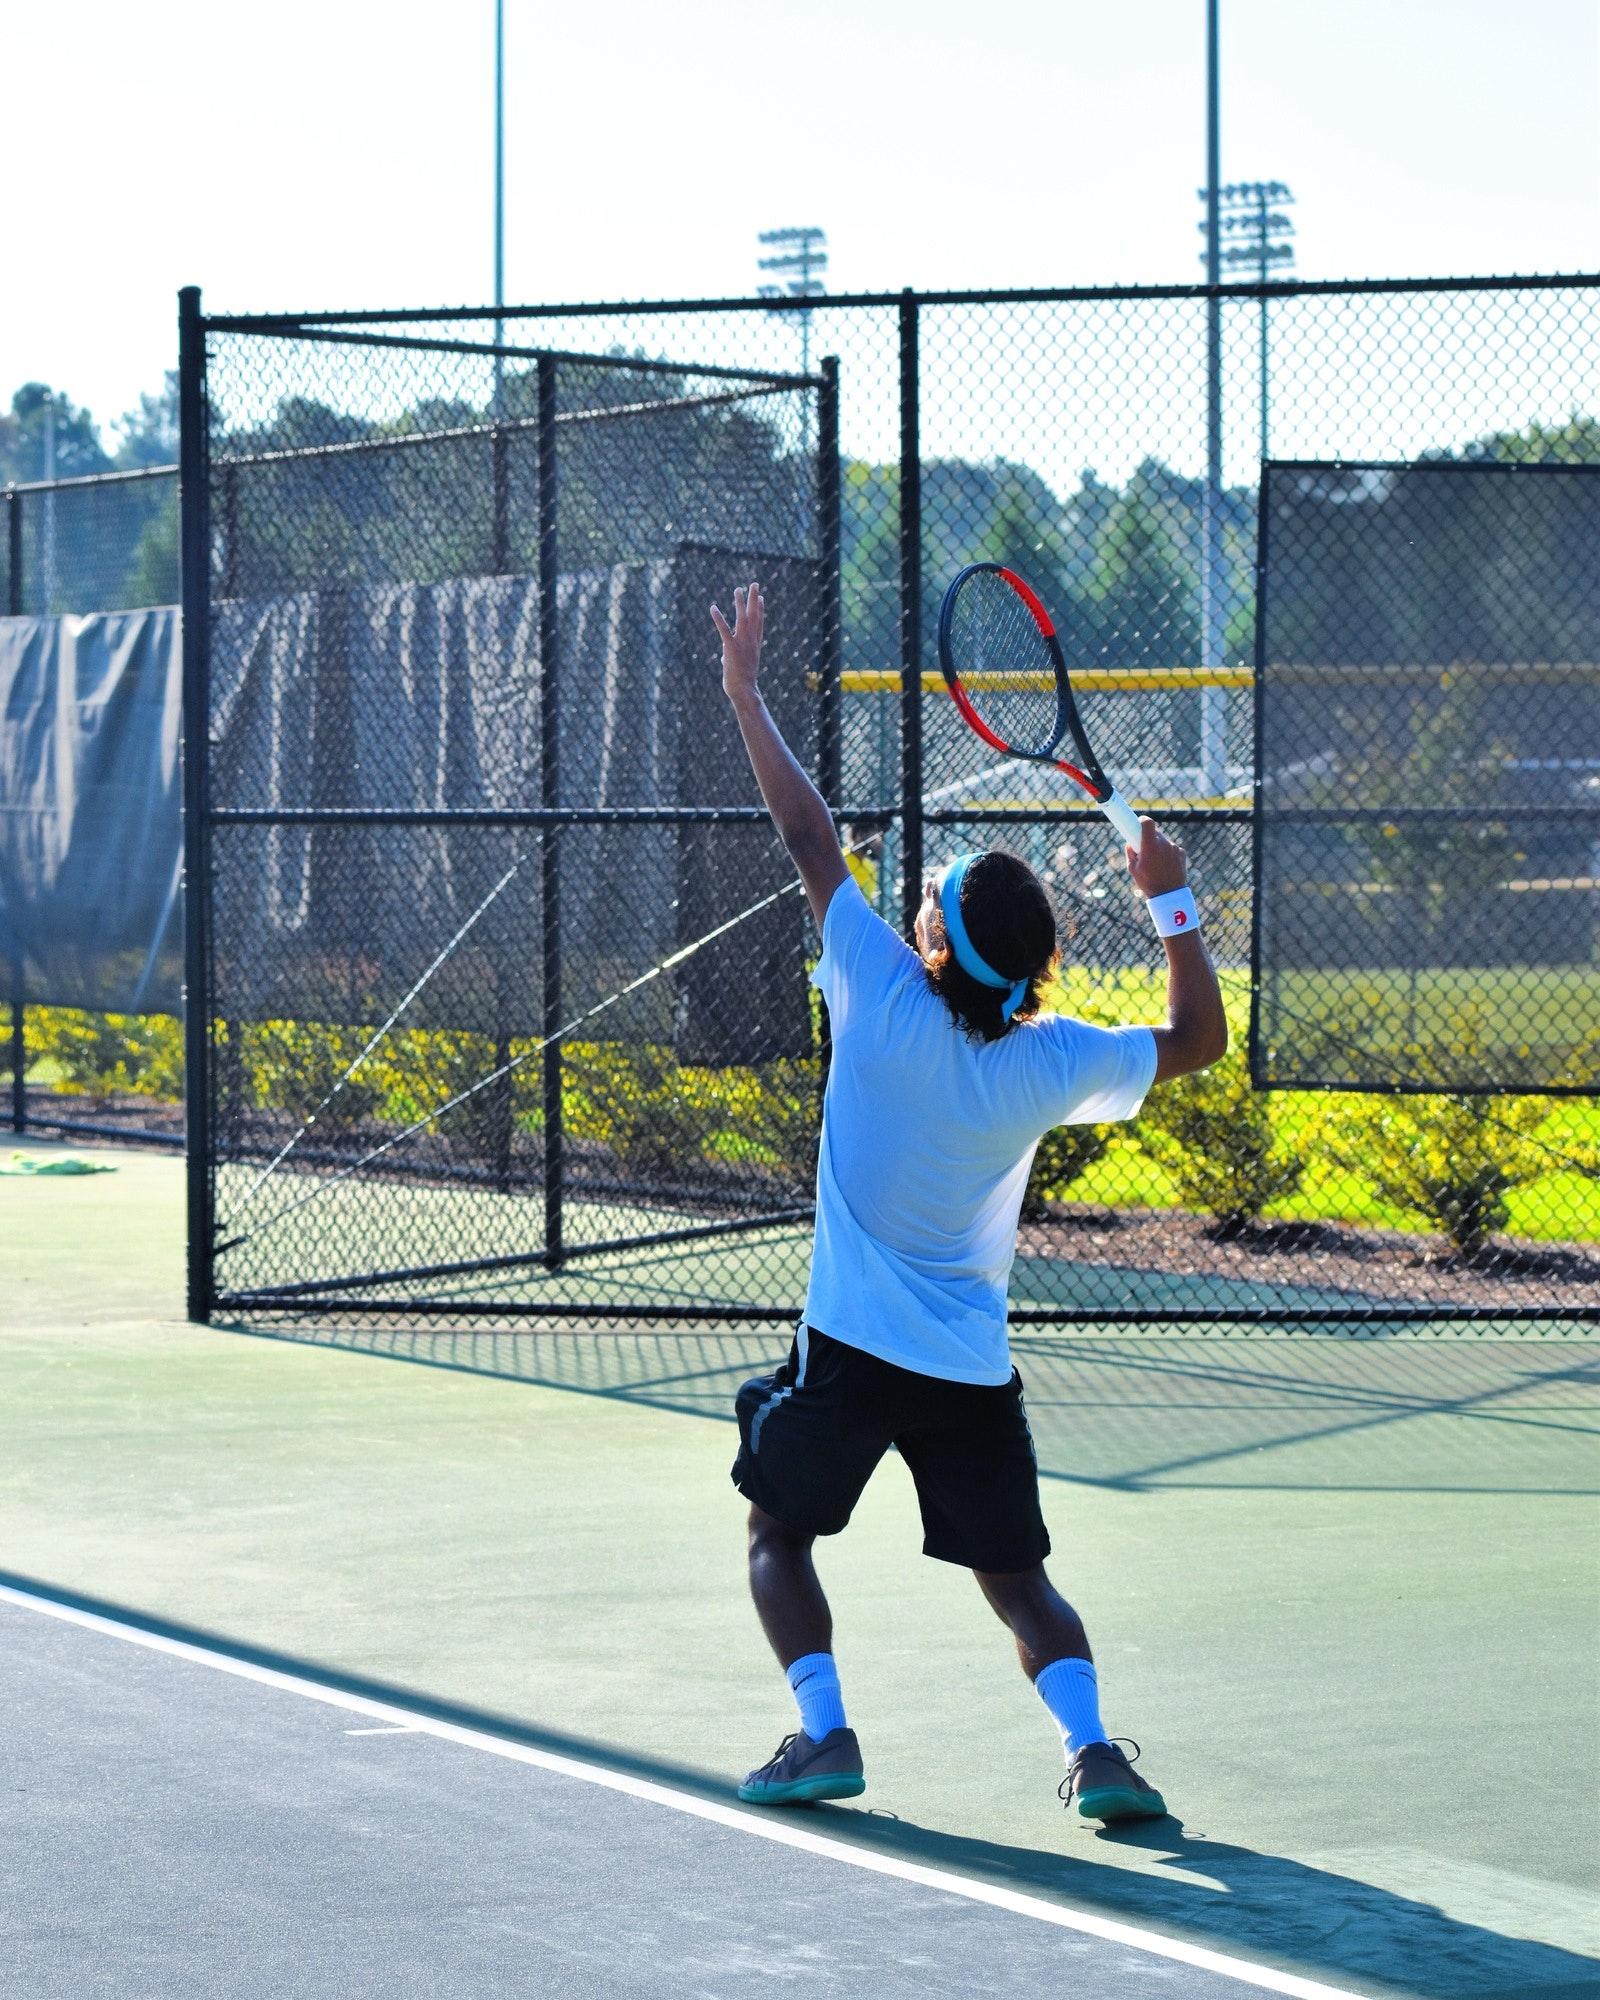 Reinaldo G. teaches tennis lessons in Plantation , FL